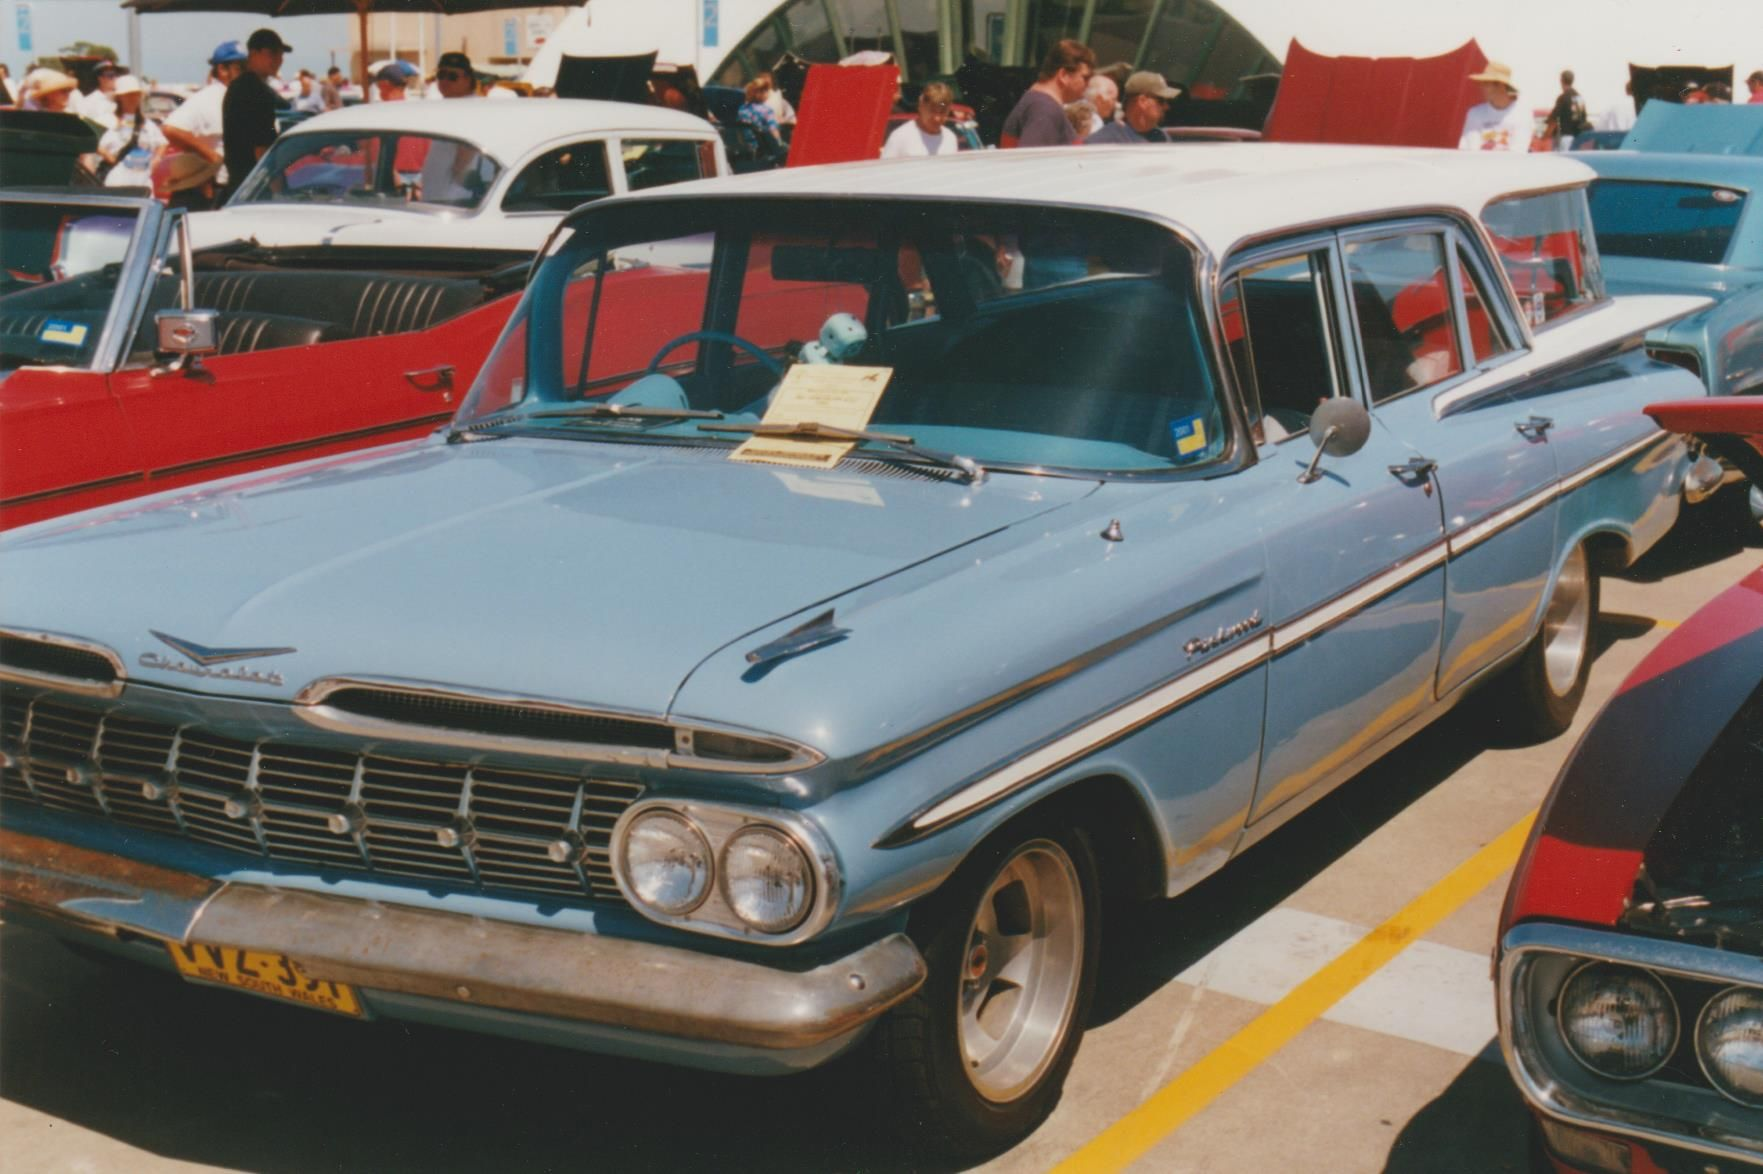 1970 chev impala station wagon lhd recent import chevs in australia pinterest station wagon and impalas